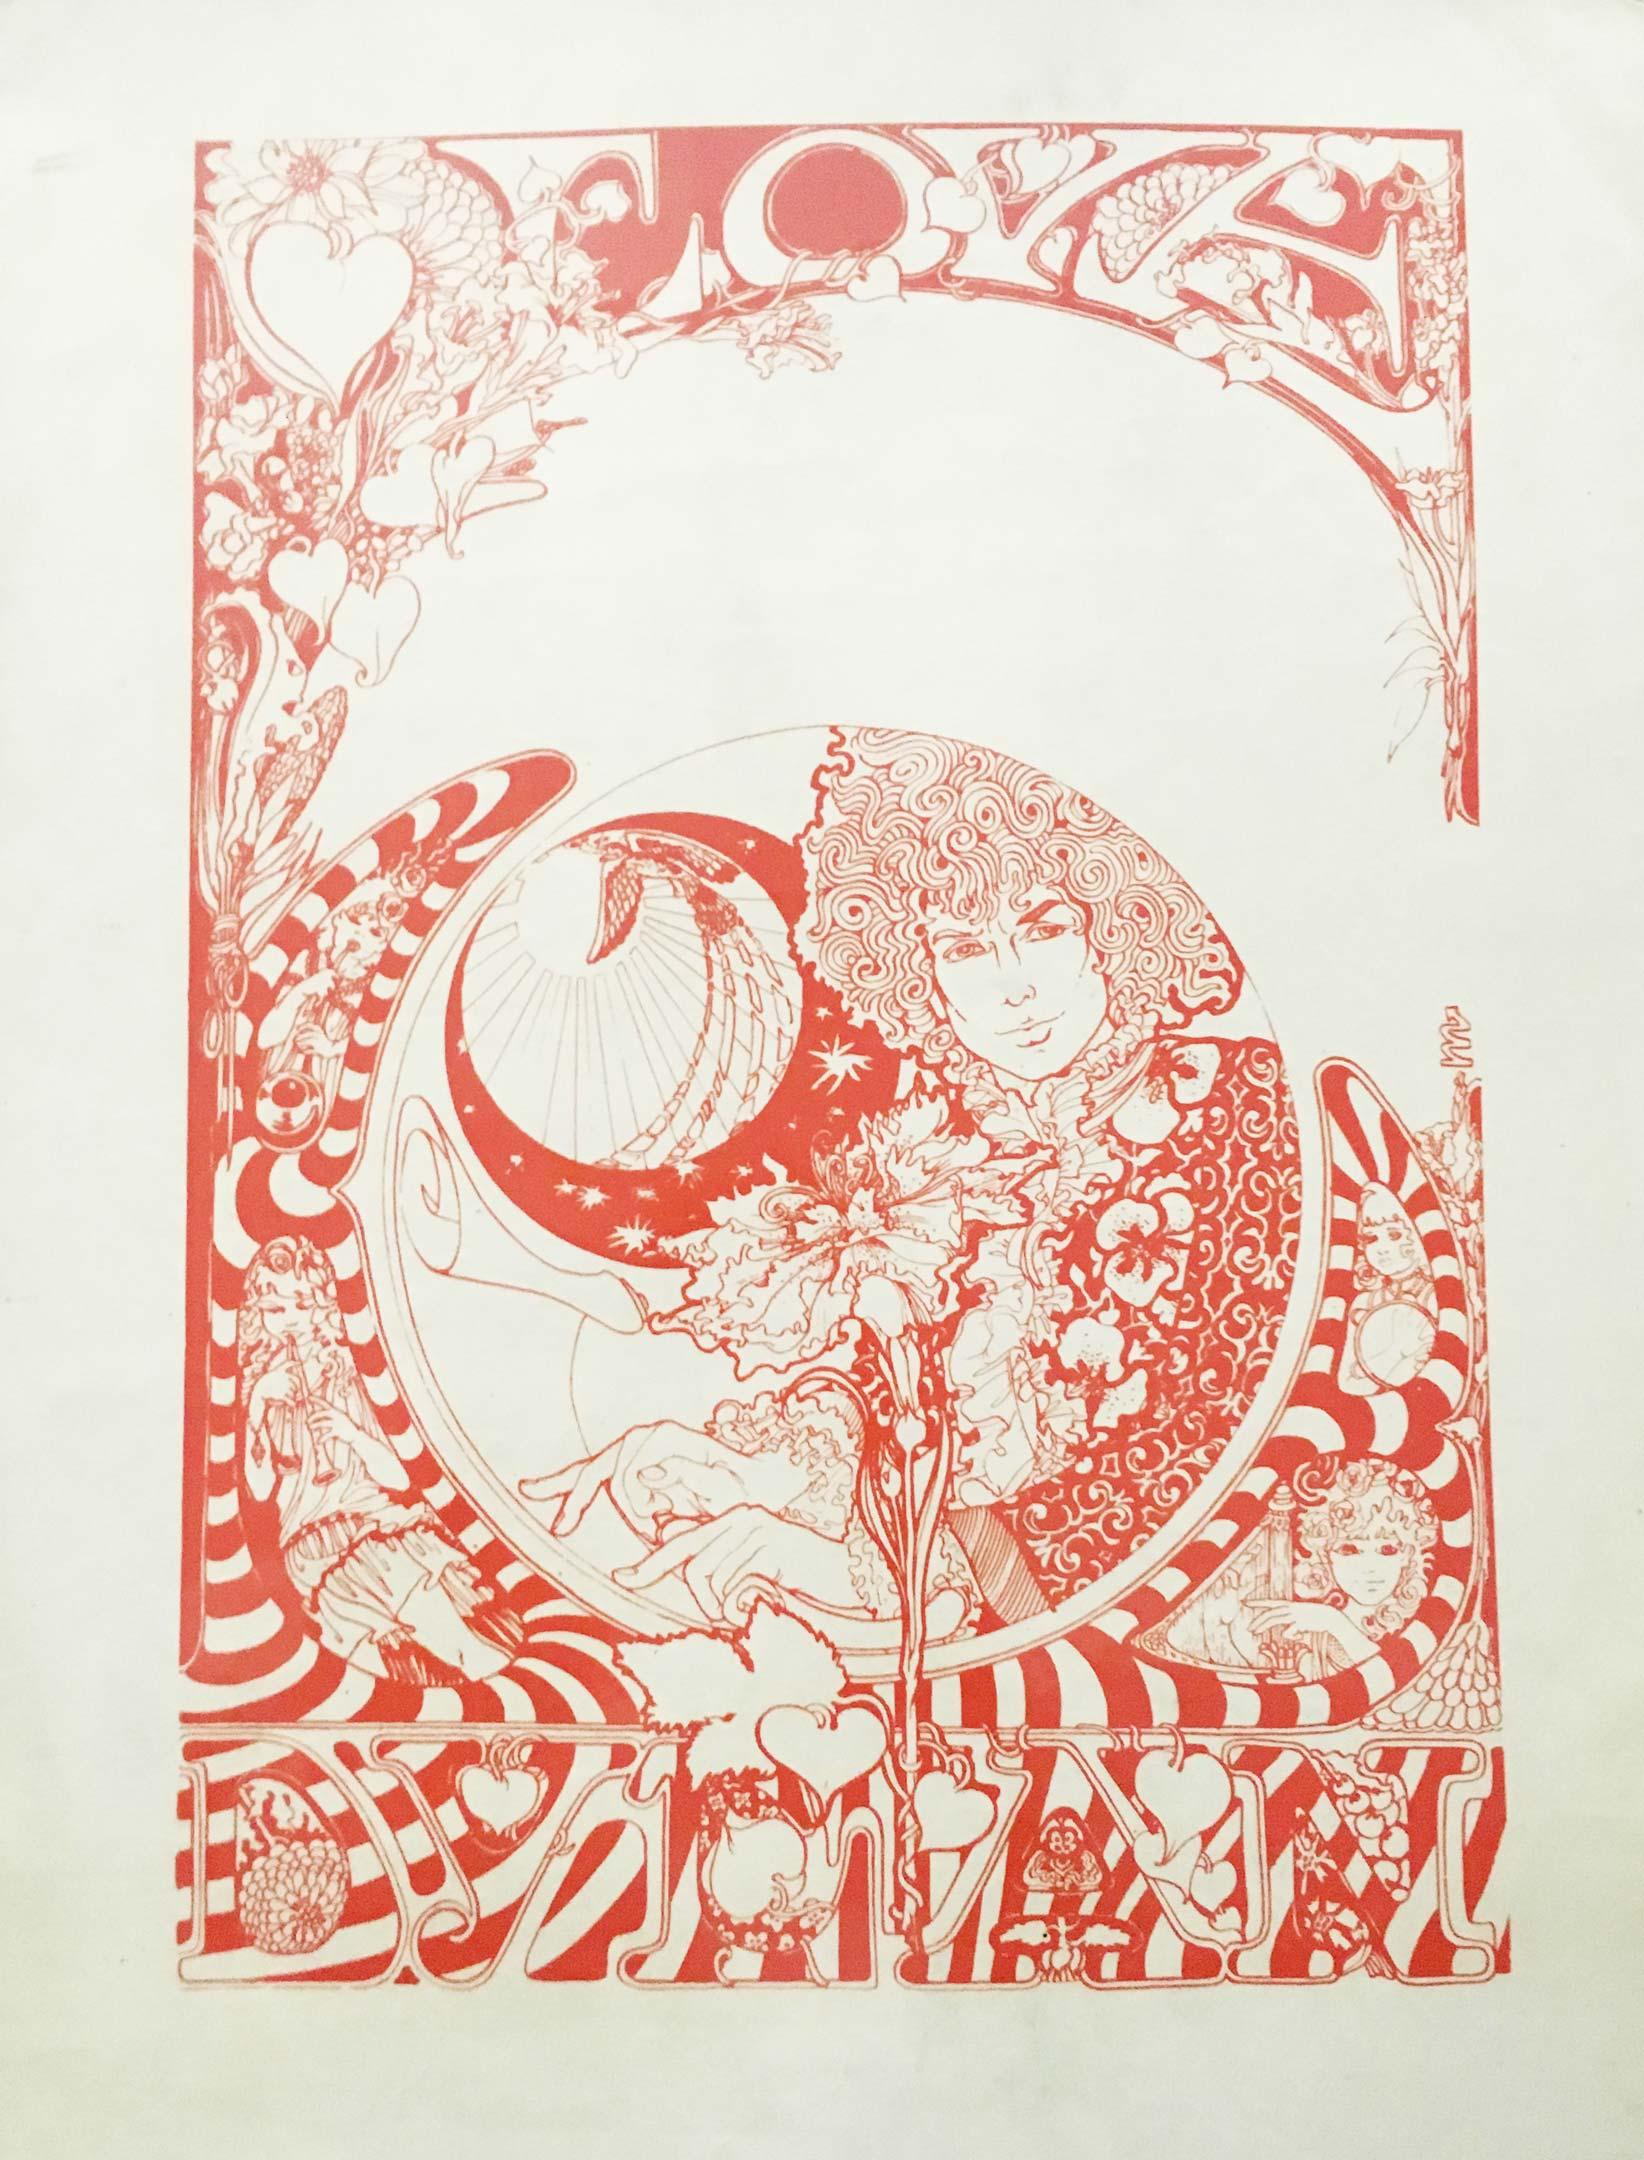 Bob Dylan 1966 Poster